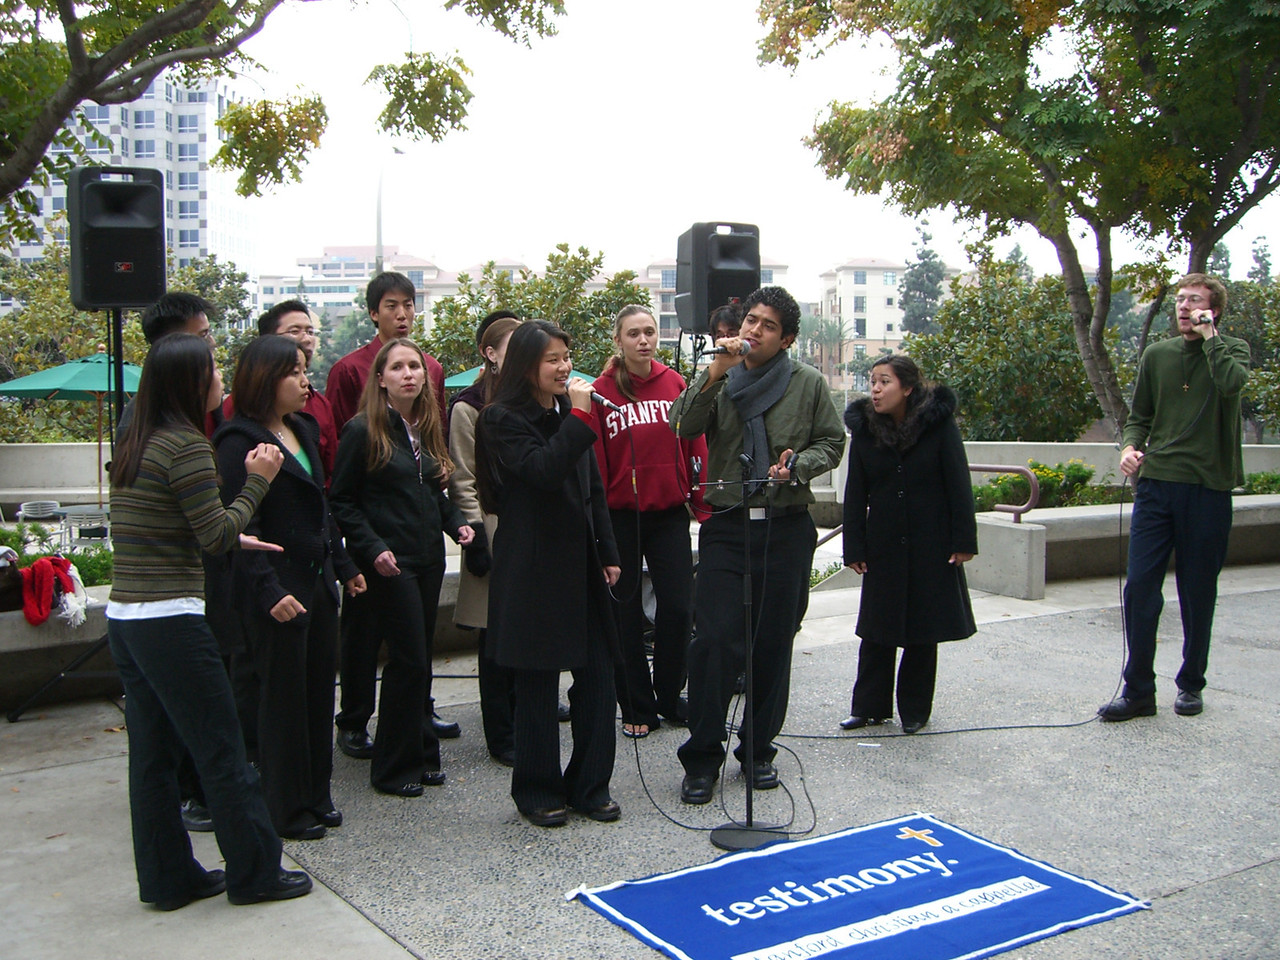 2005 12 18 Sun - Lake Ave Church - Jenn Kim & Pablo Josue Pozo on Less Is More & Rob Majors in no-man's land